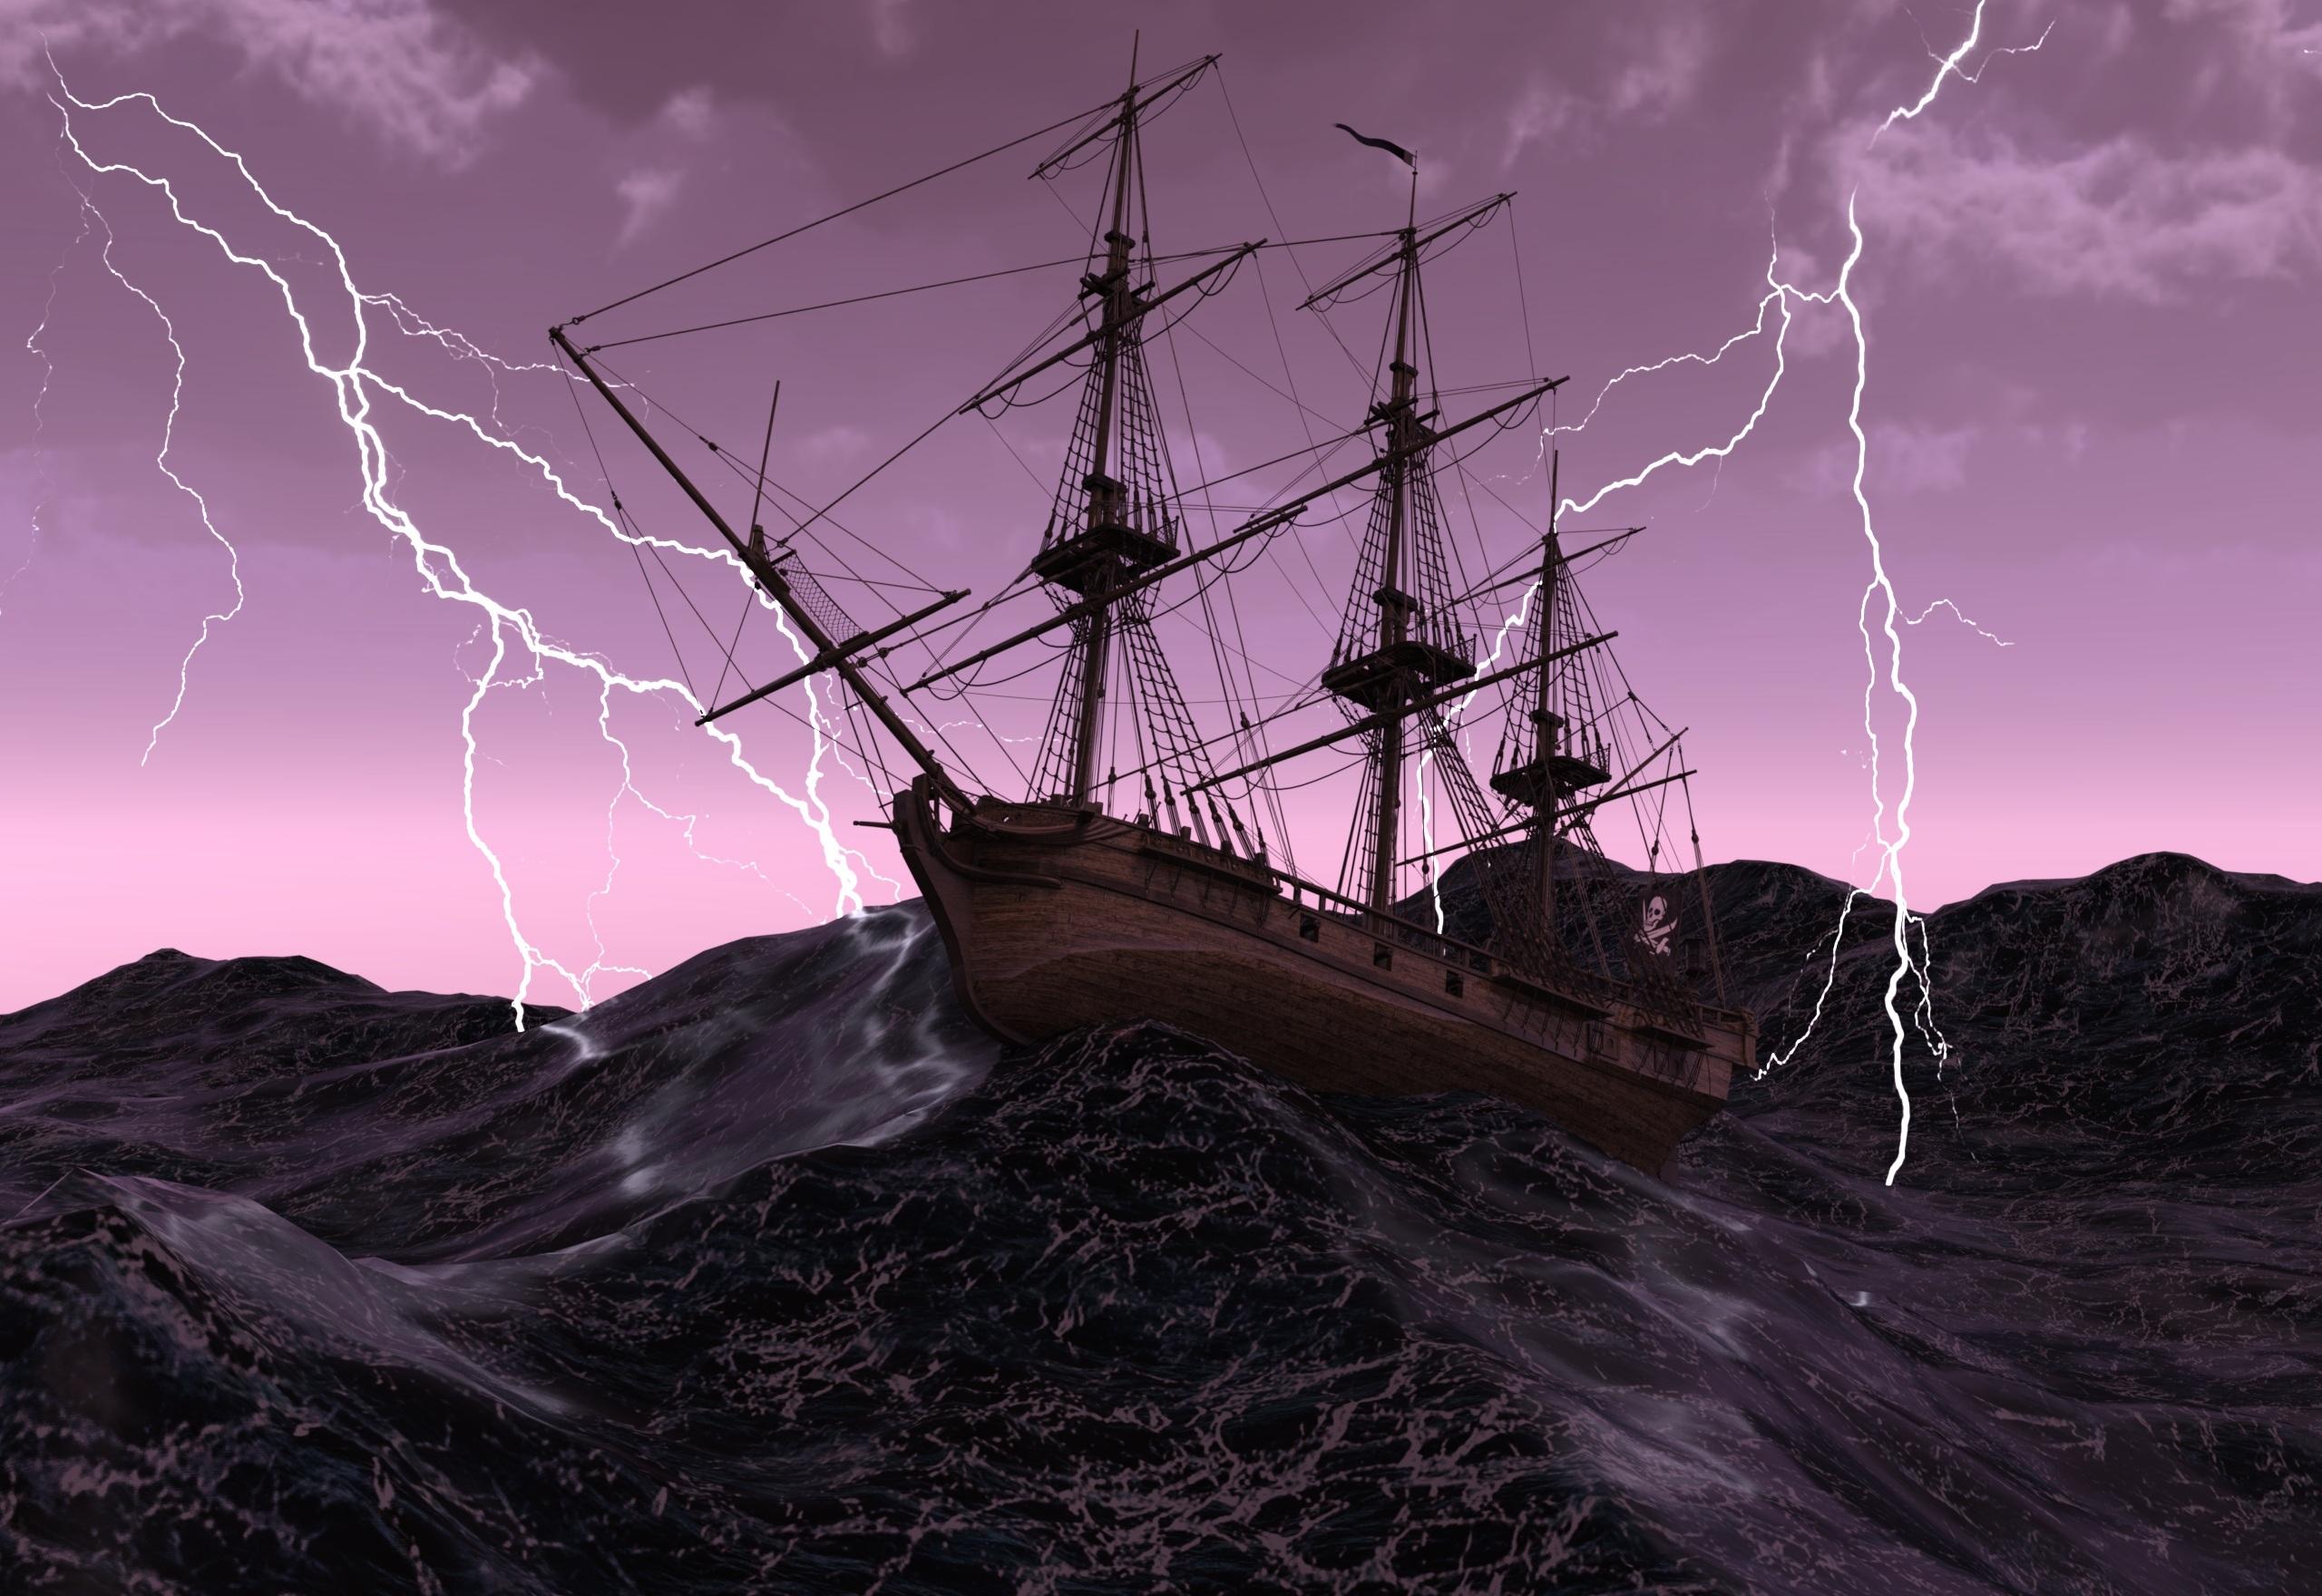 ship, sailing vessel, old